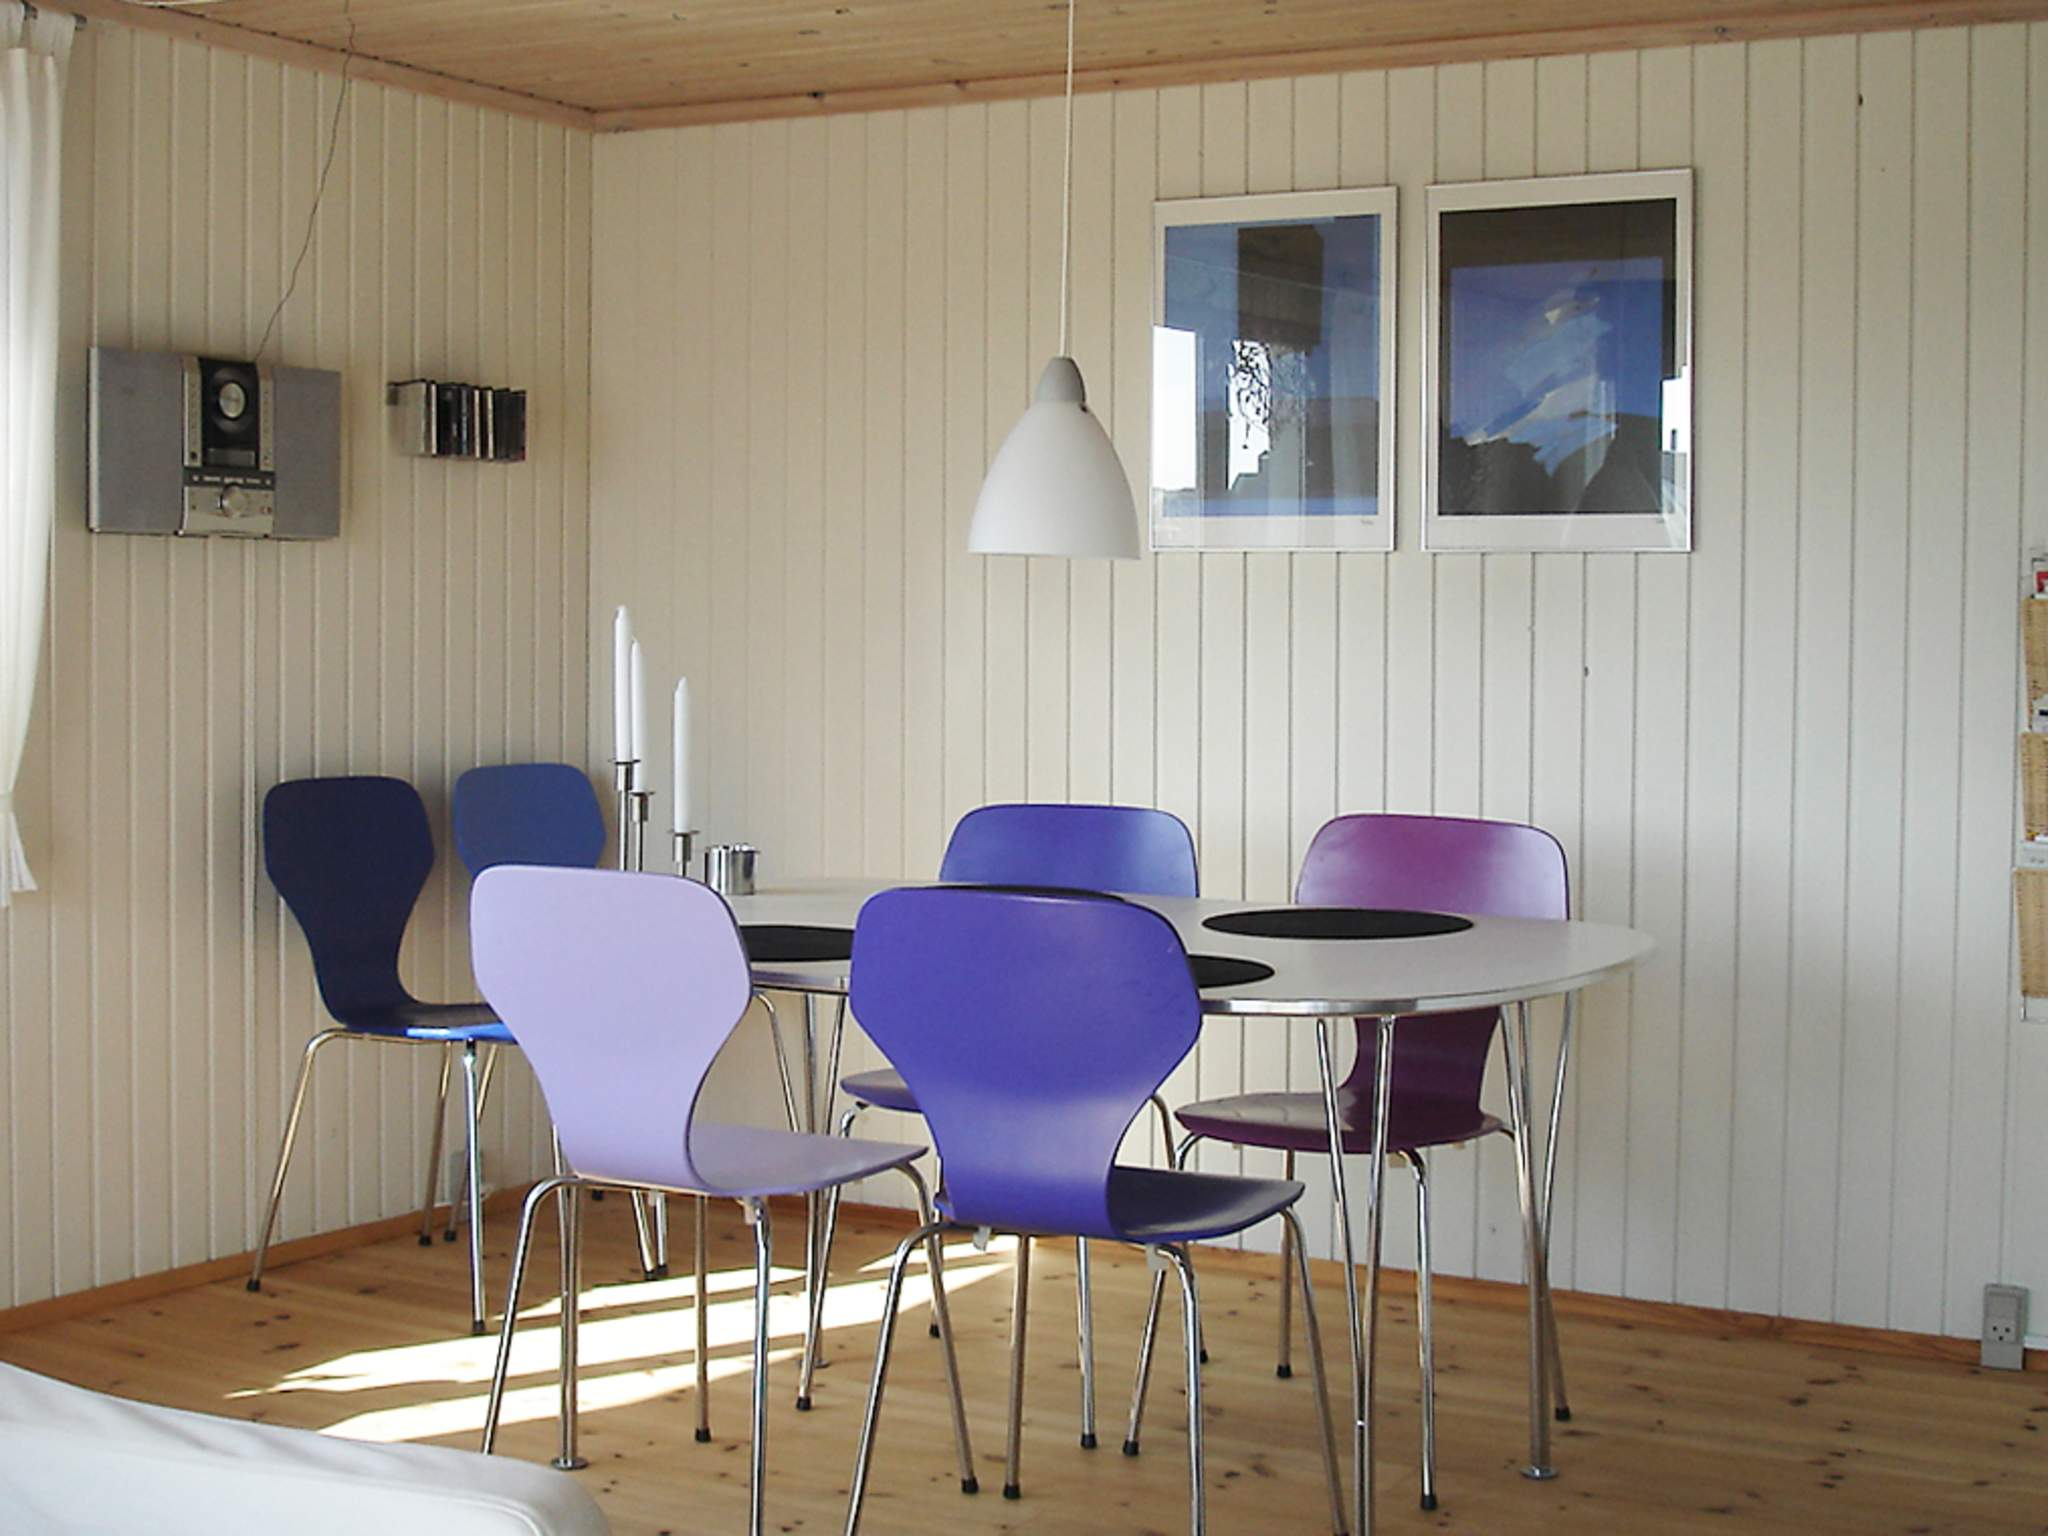 Ferienhaus Vrist (293960), Vrist, , Limfjord, Dänemark, Bild 5